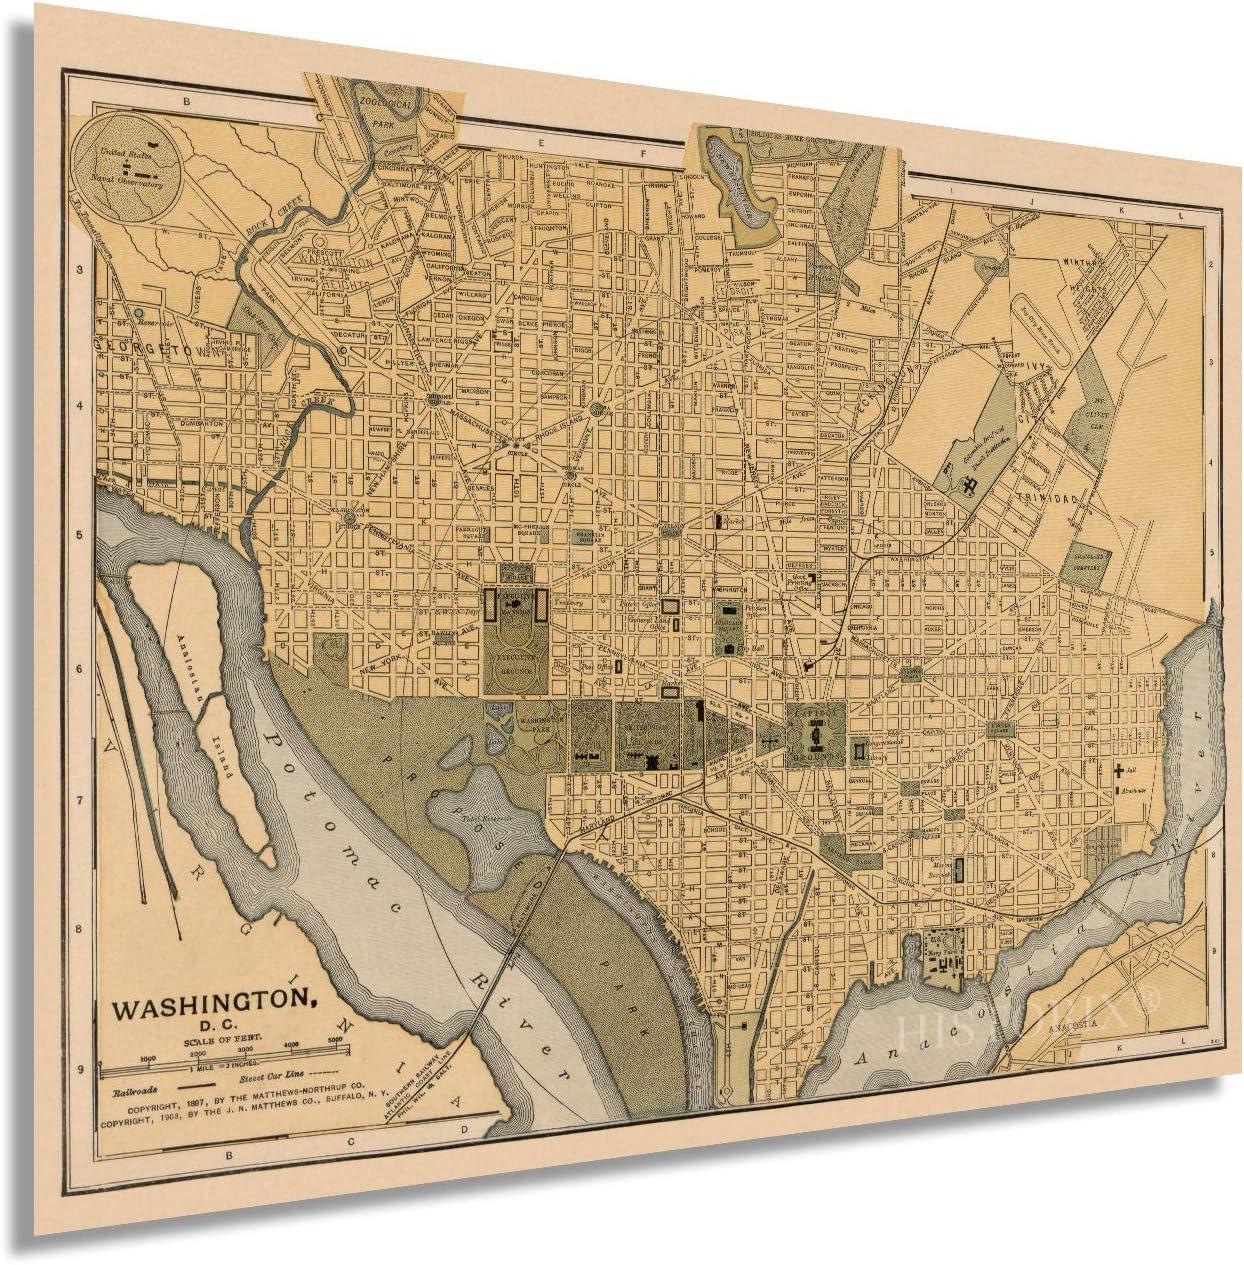 Historix Vintage 1897 Map of Overseas parallel Popular standard import regular item Washington Washingt - Inch DC 18x24